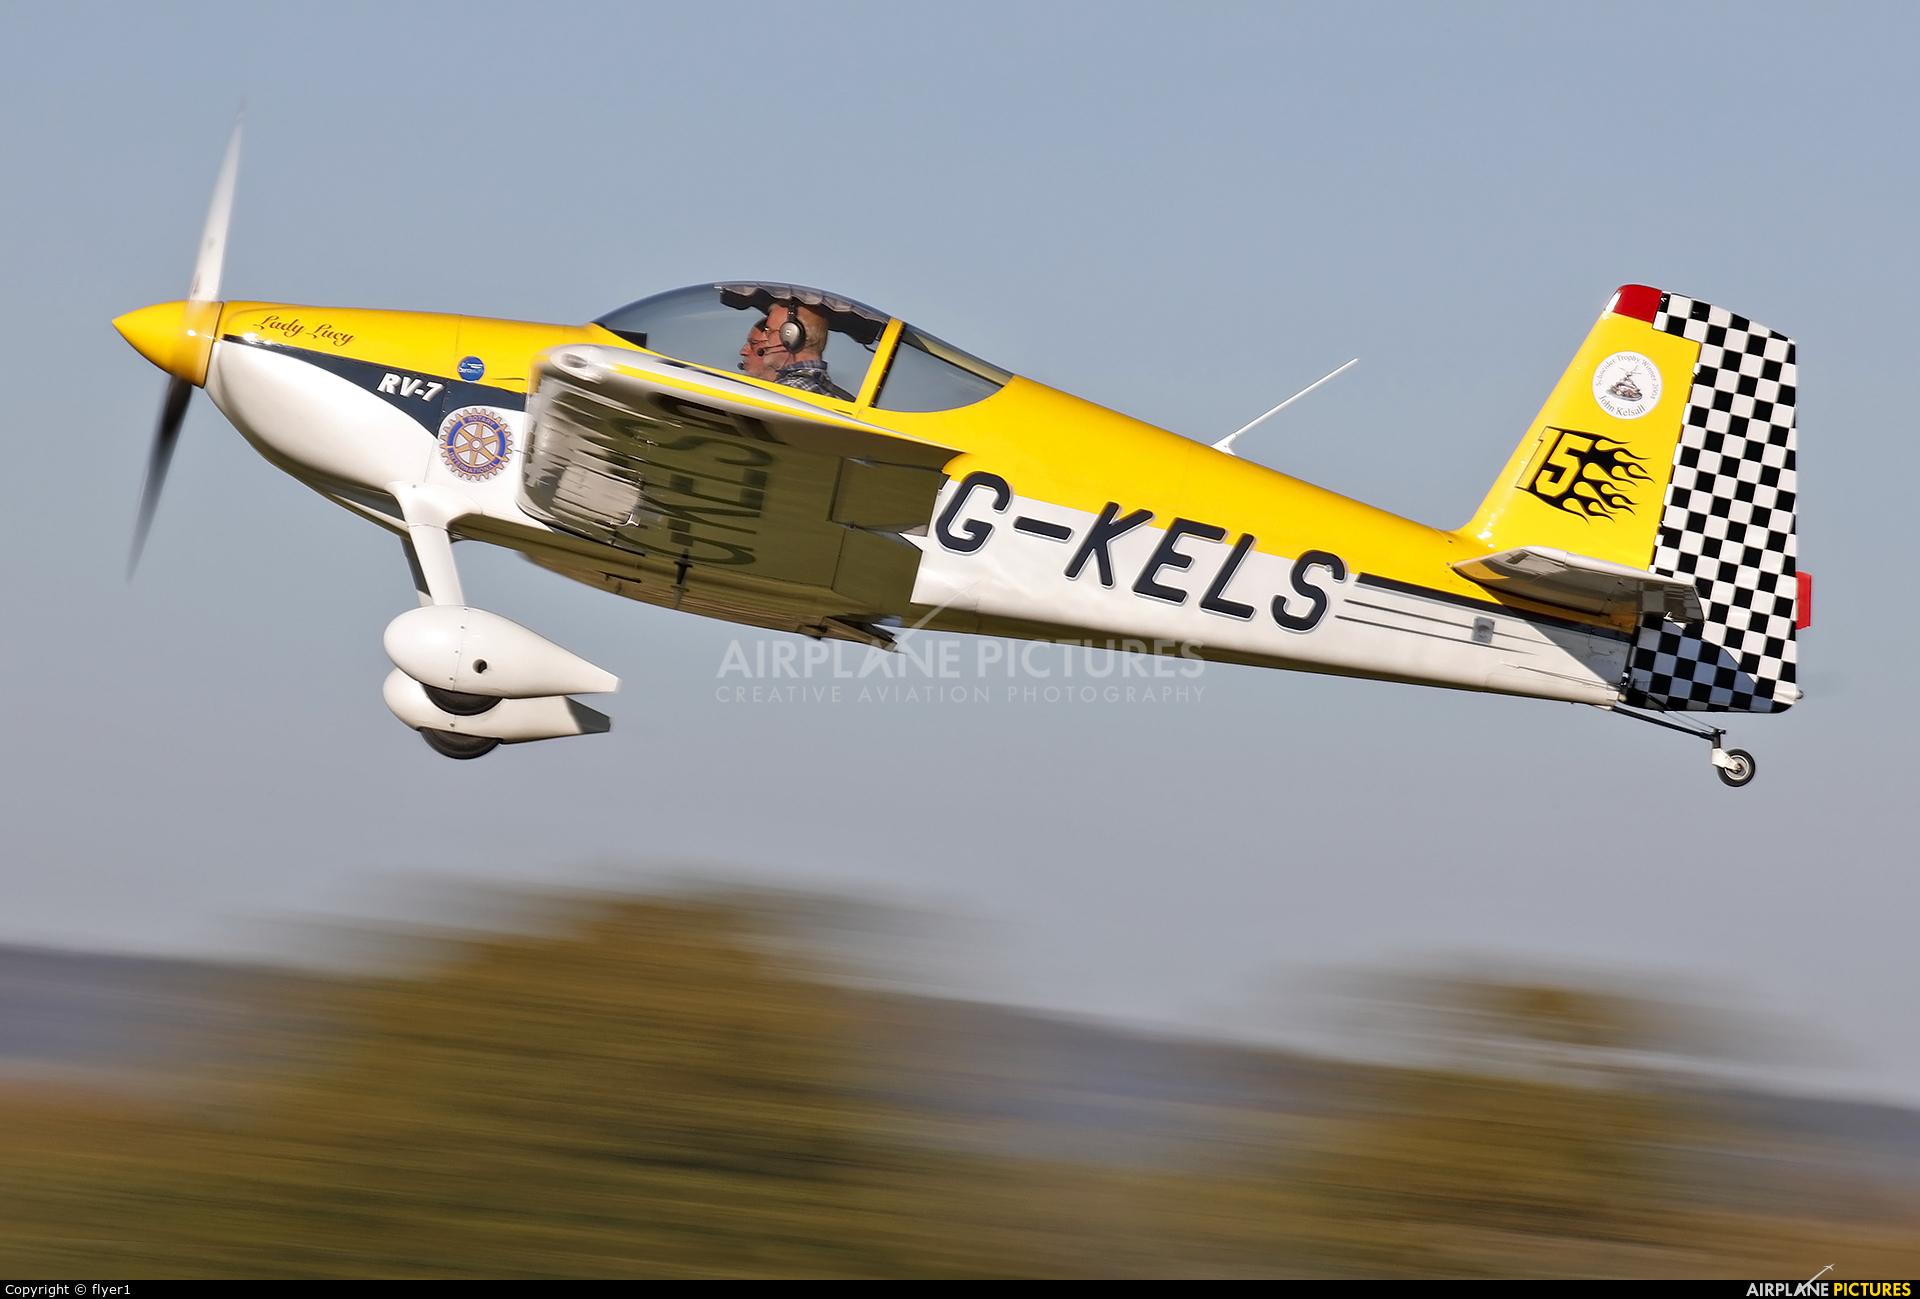 Private G-KELS aircraft at Lashenden / Headcorn